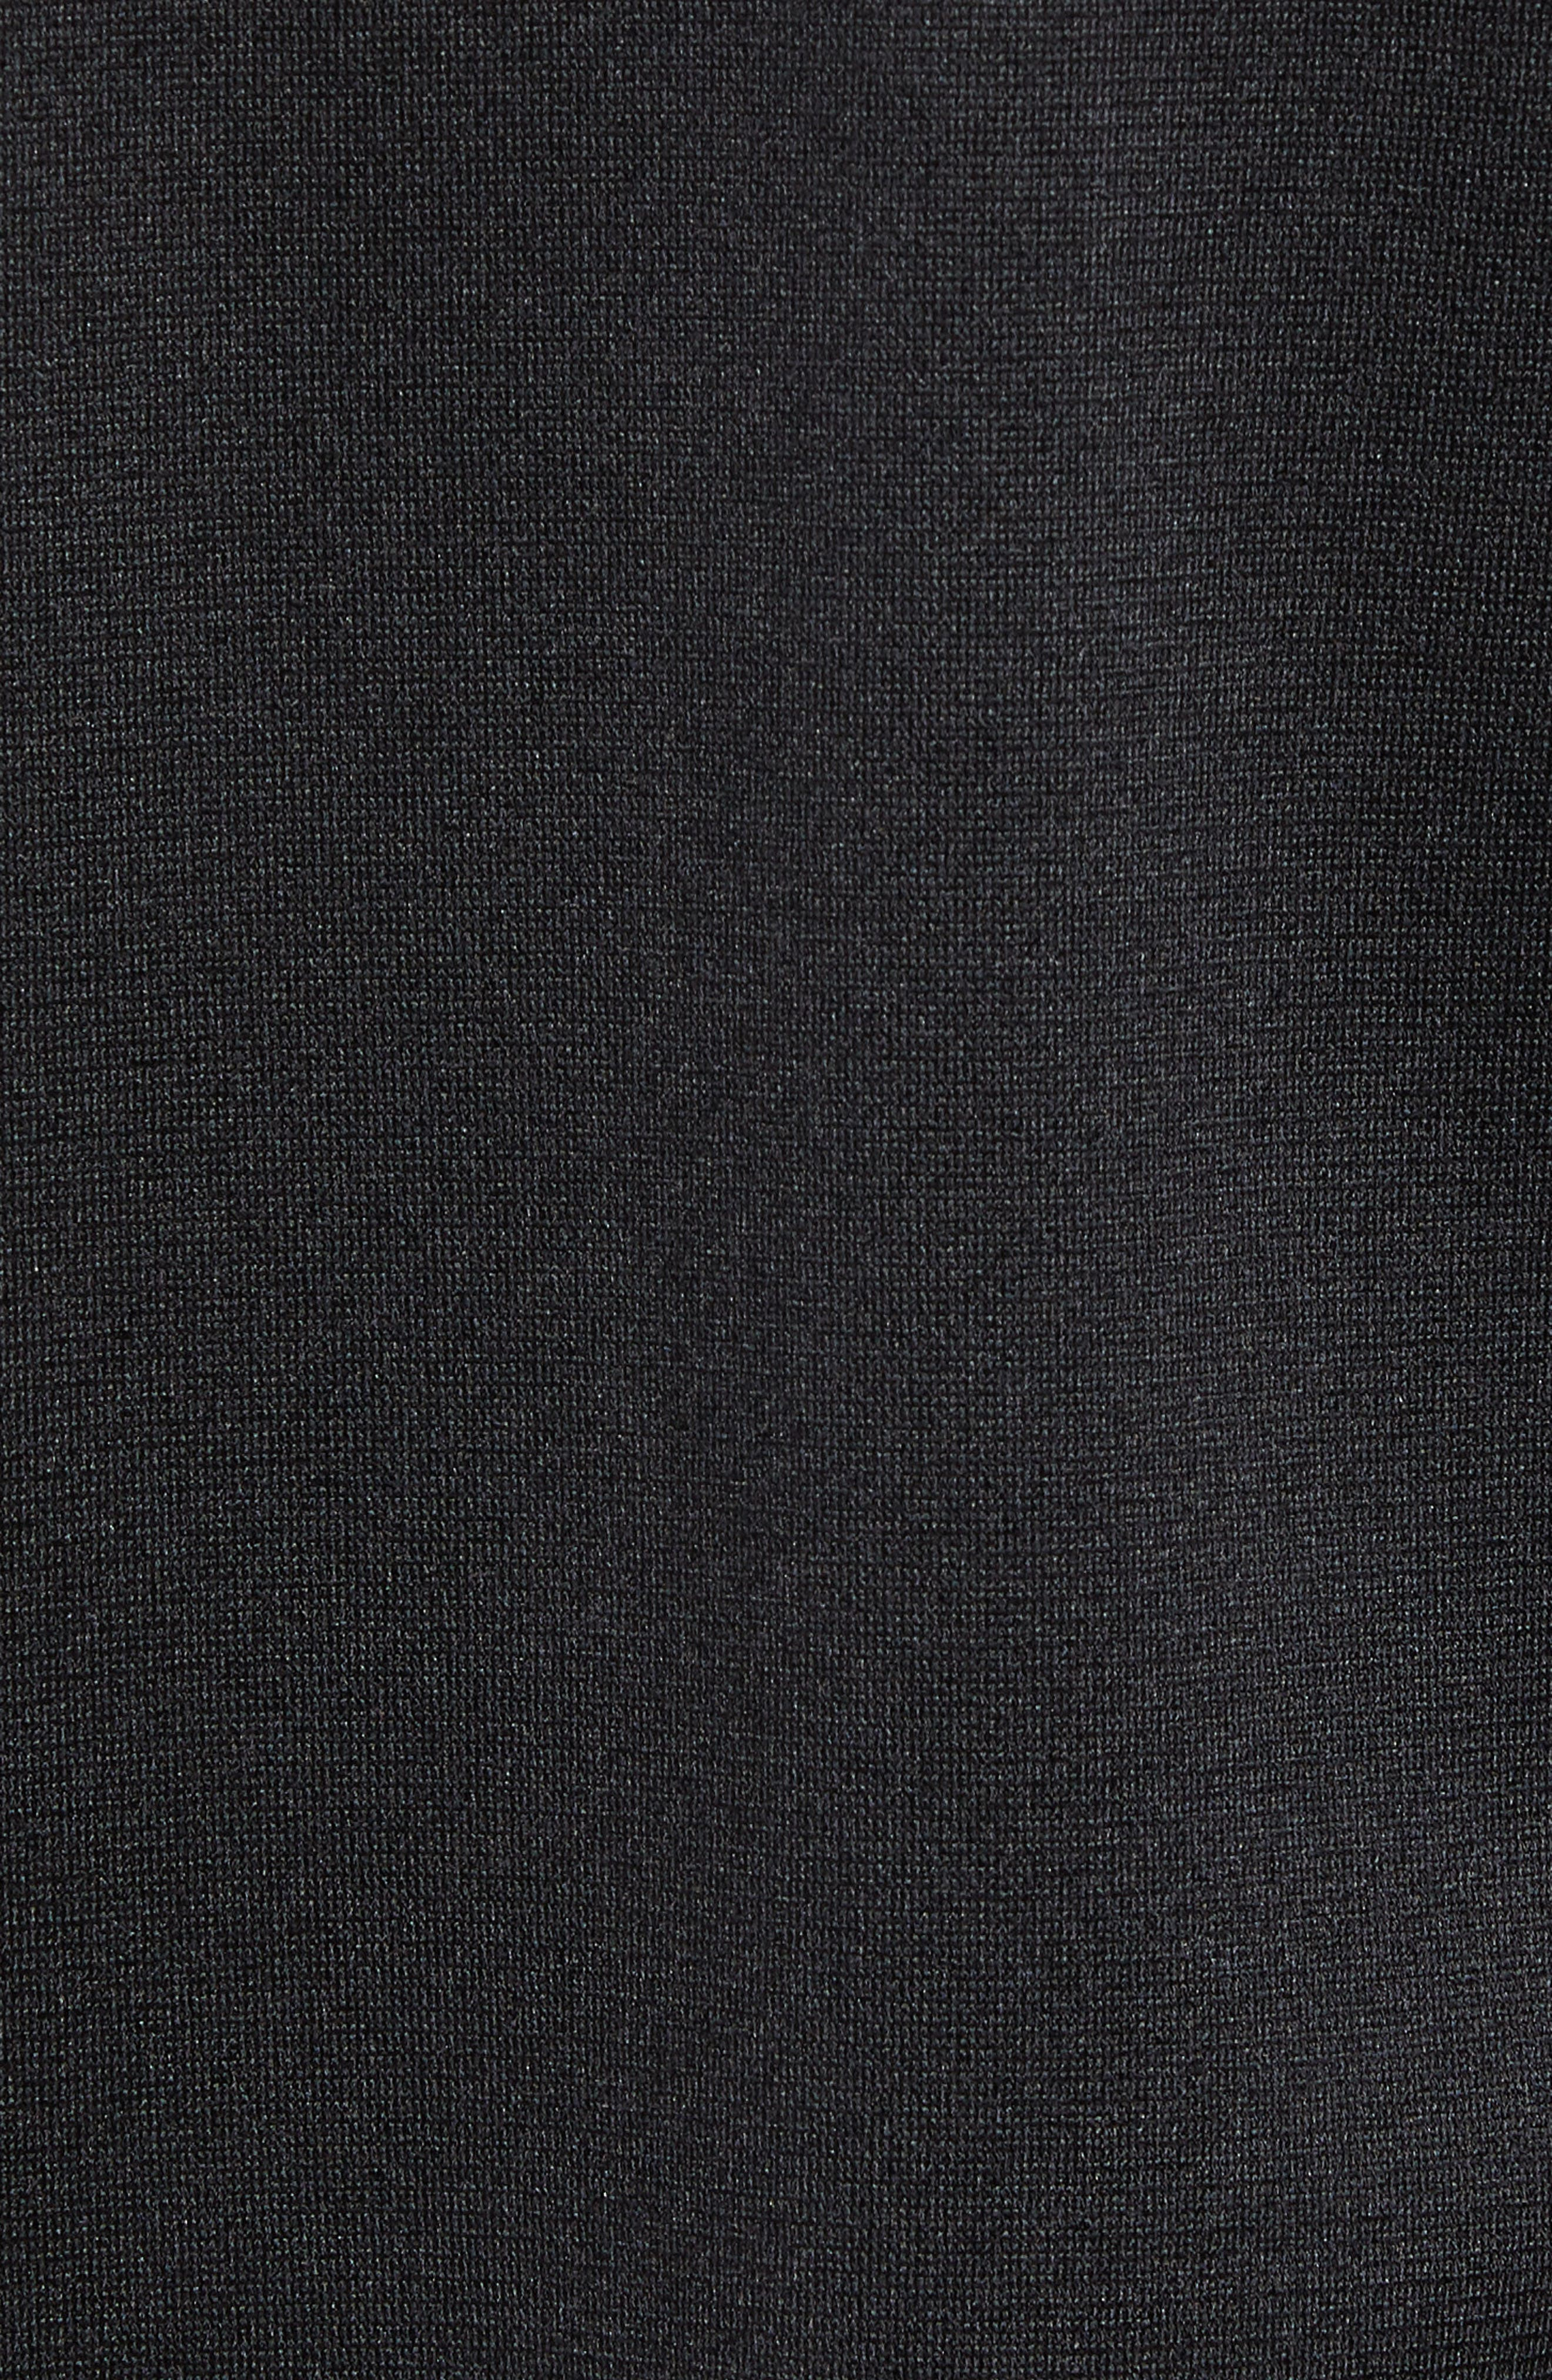 Alphabet City Track Jacket,                             Alternate thumbnail 6, color,                             TNF BLACK